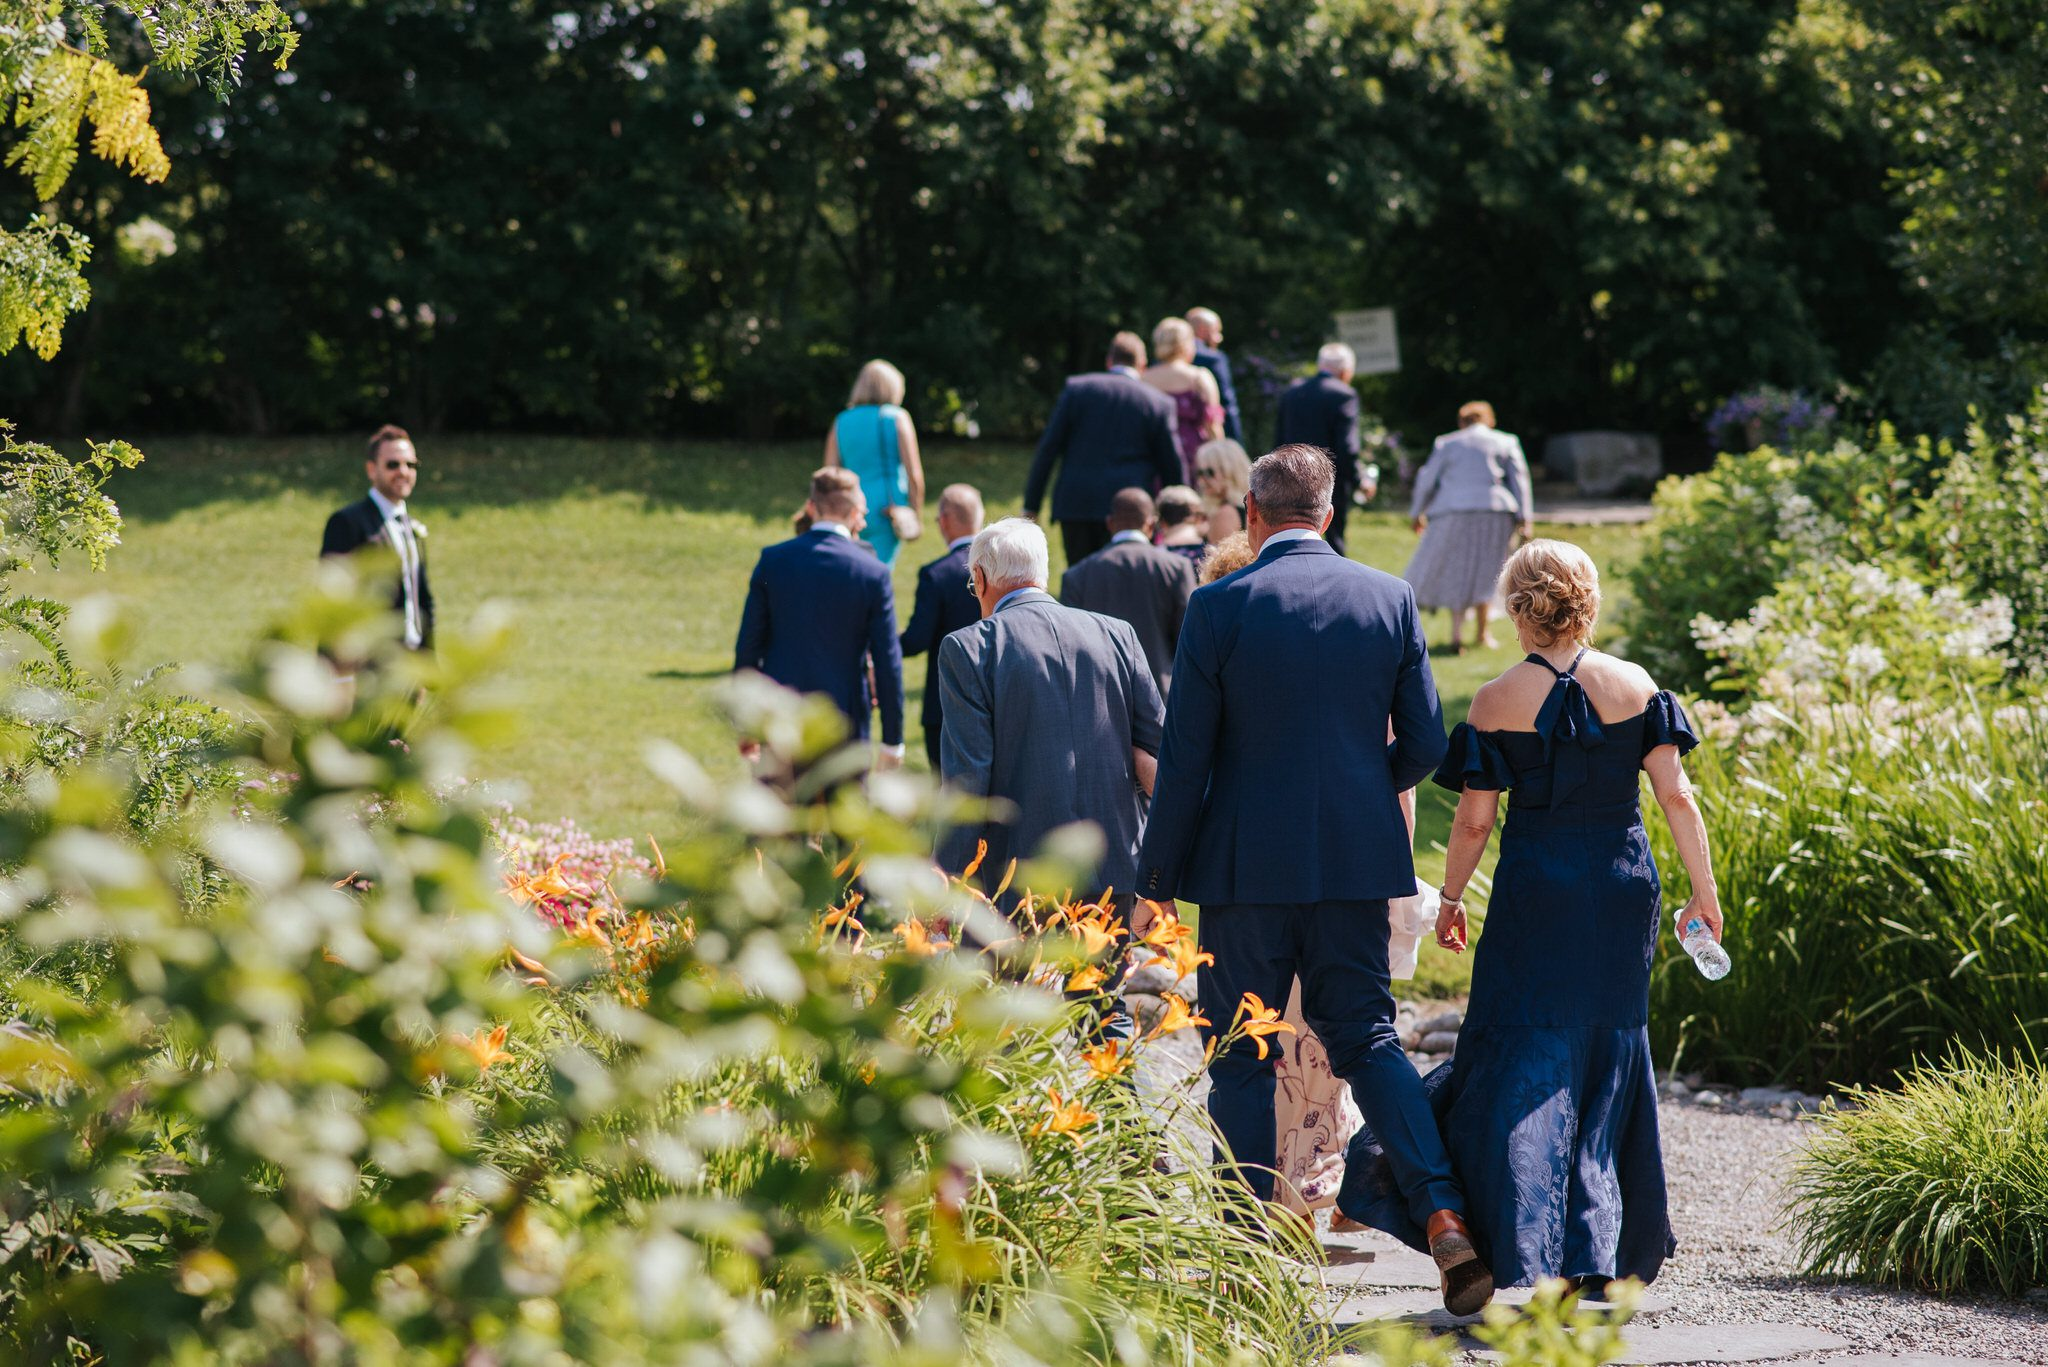 Bloomfield Gardens Wedding - guests arriving